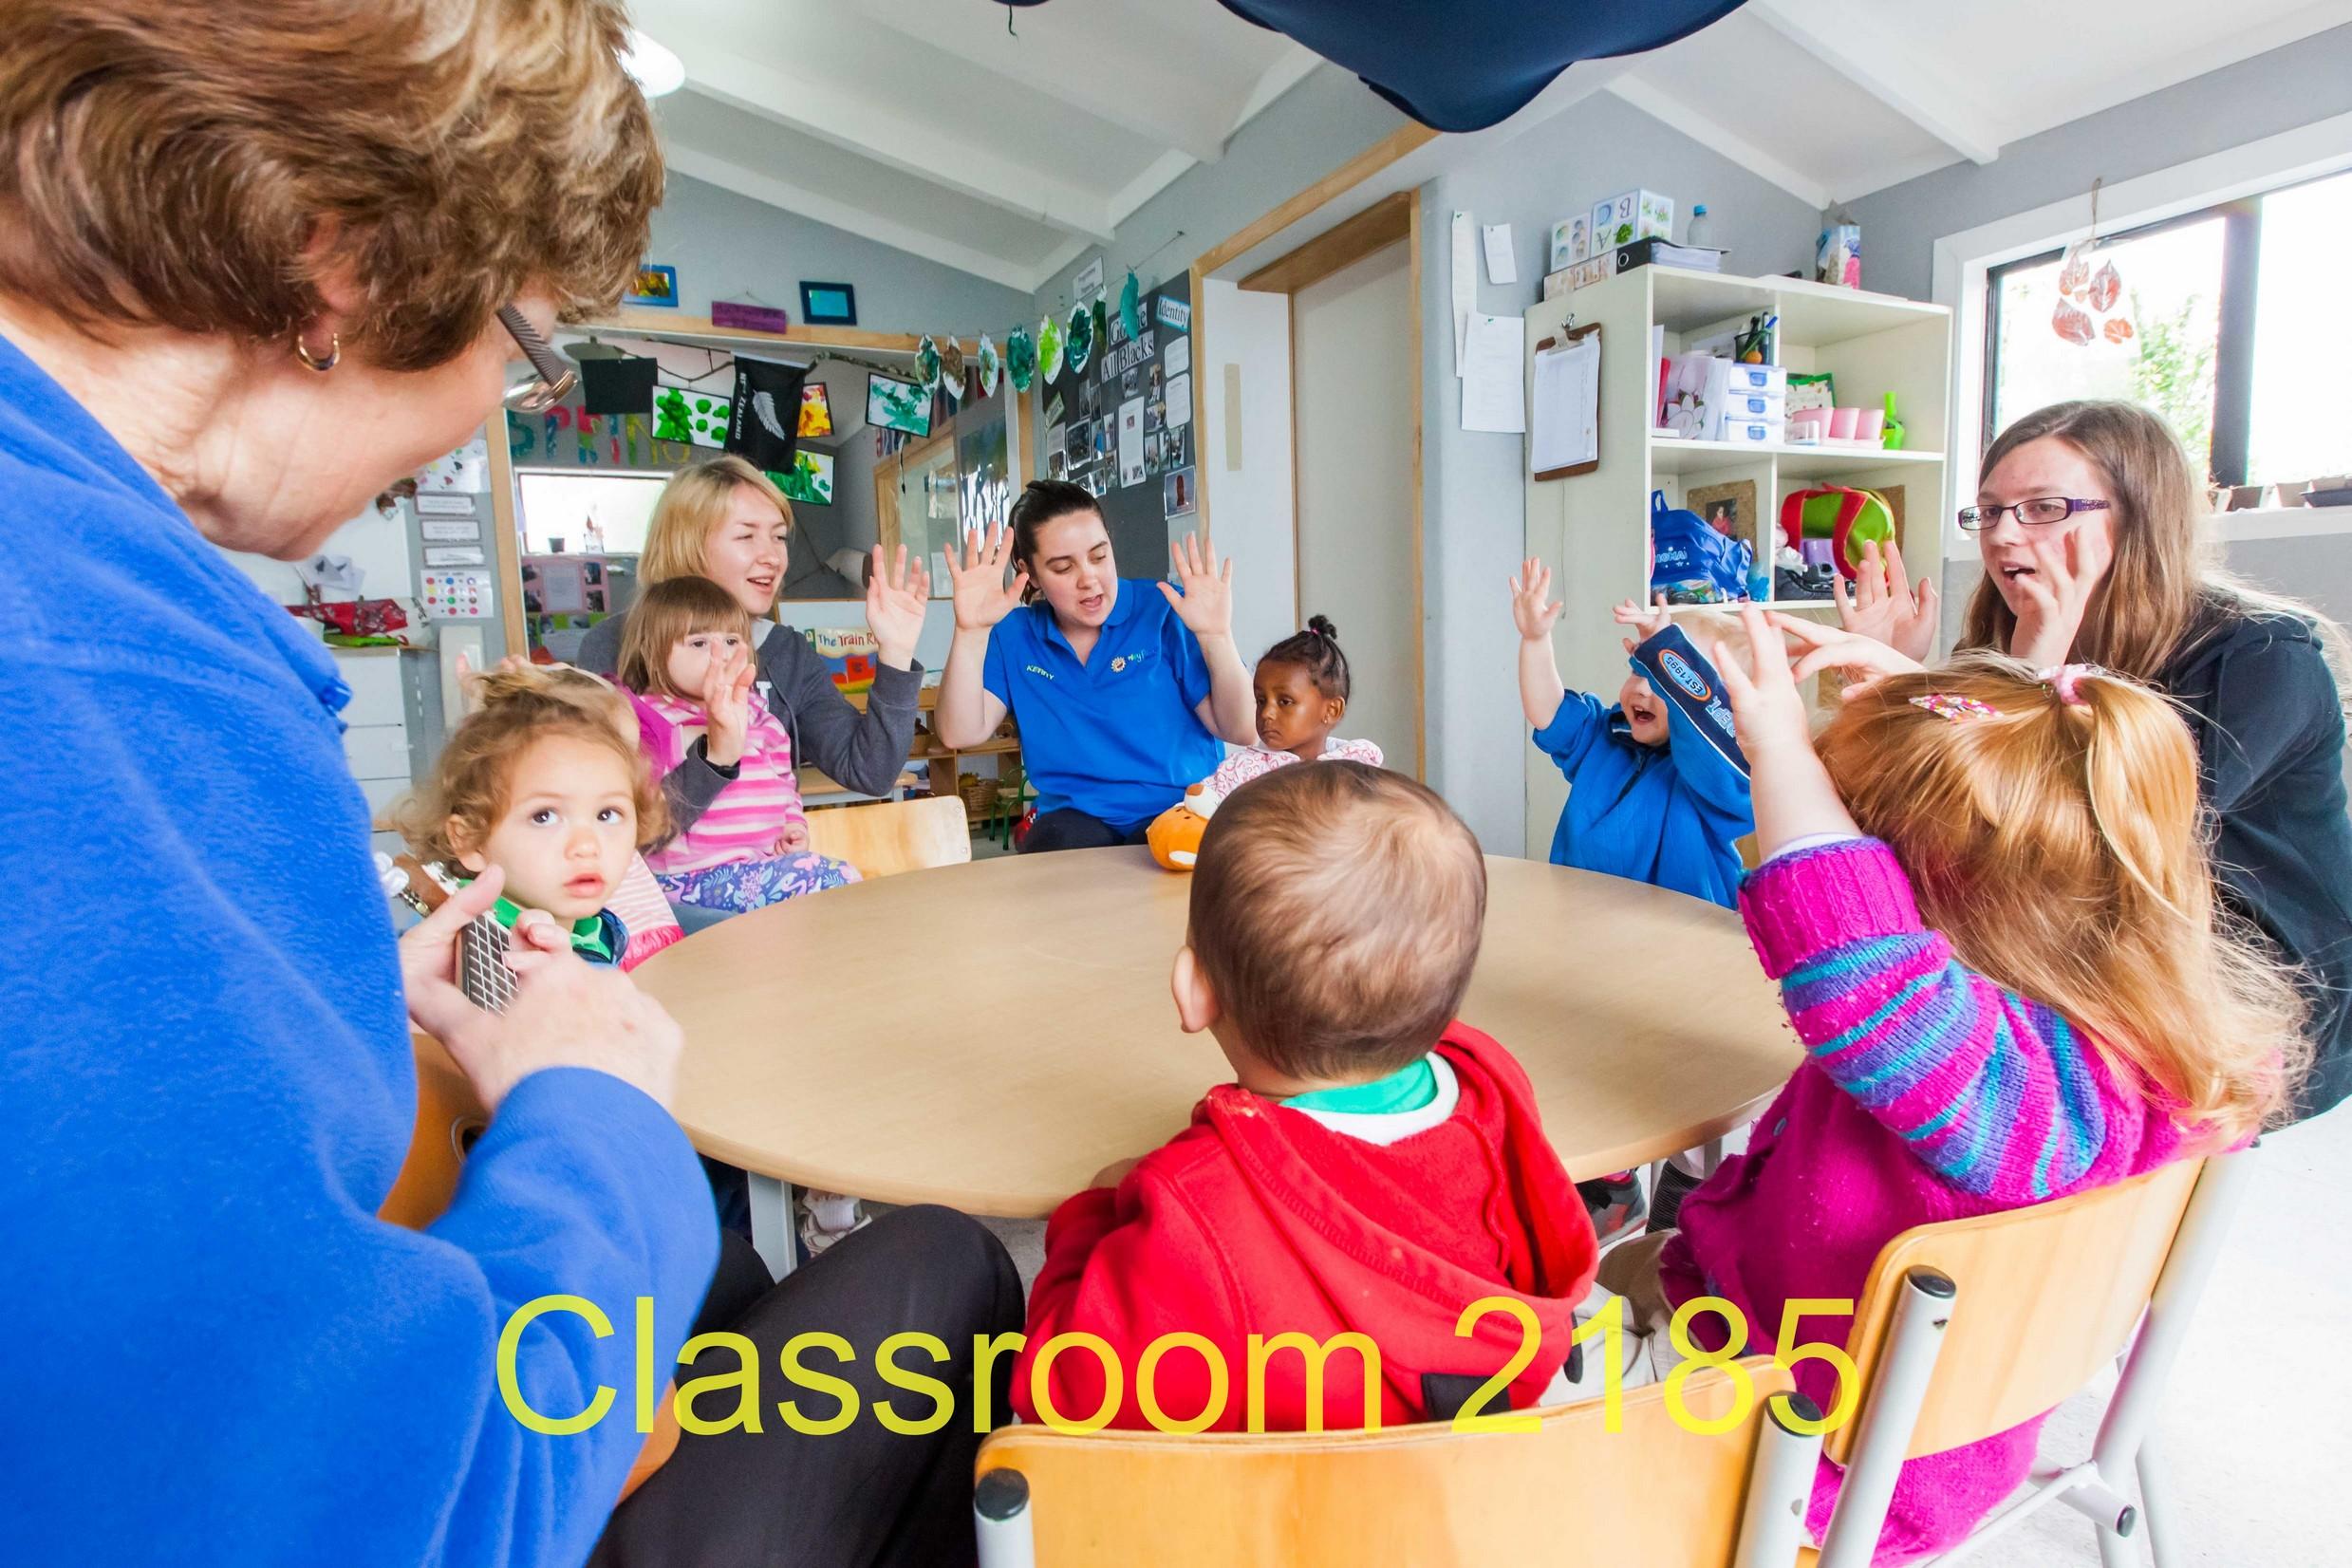 Classroom 2185